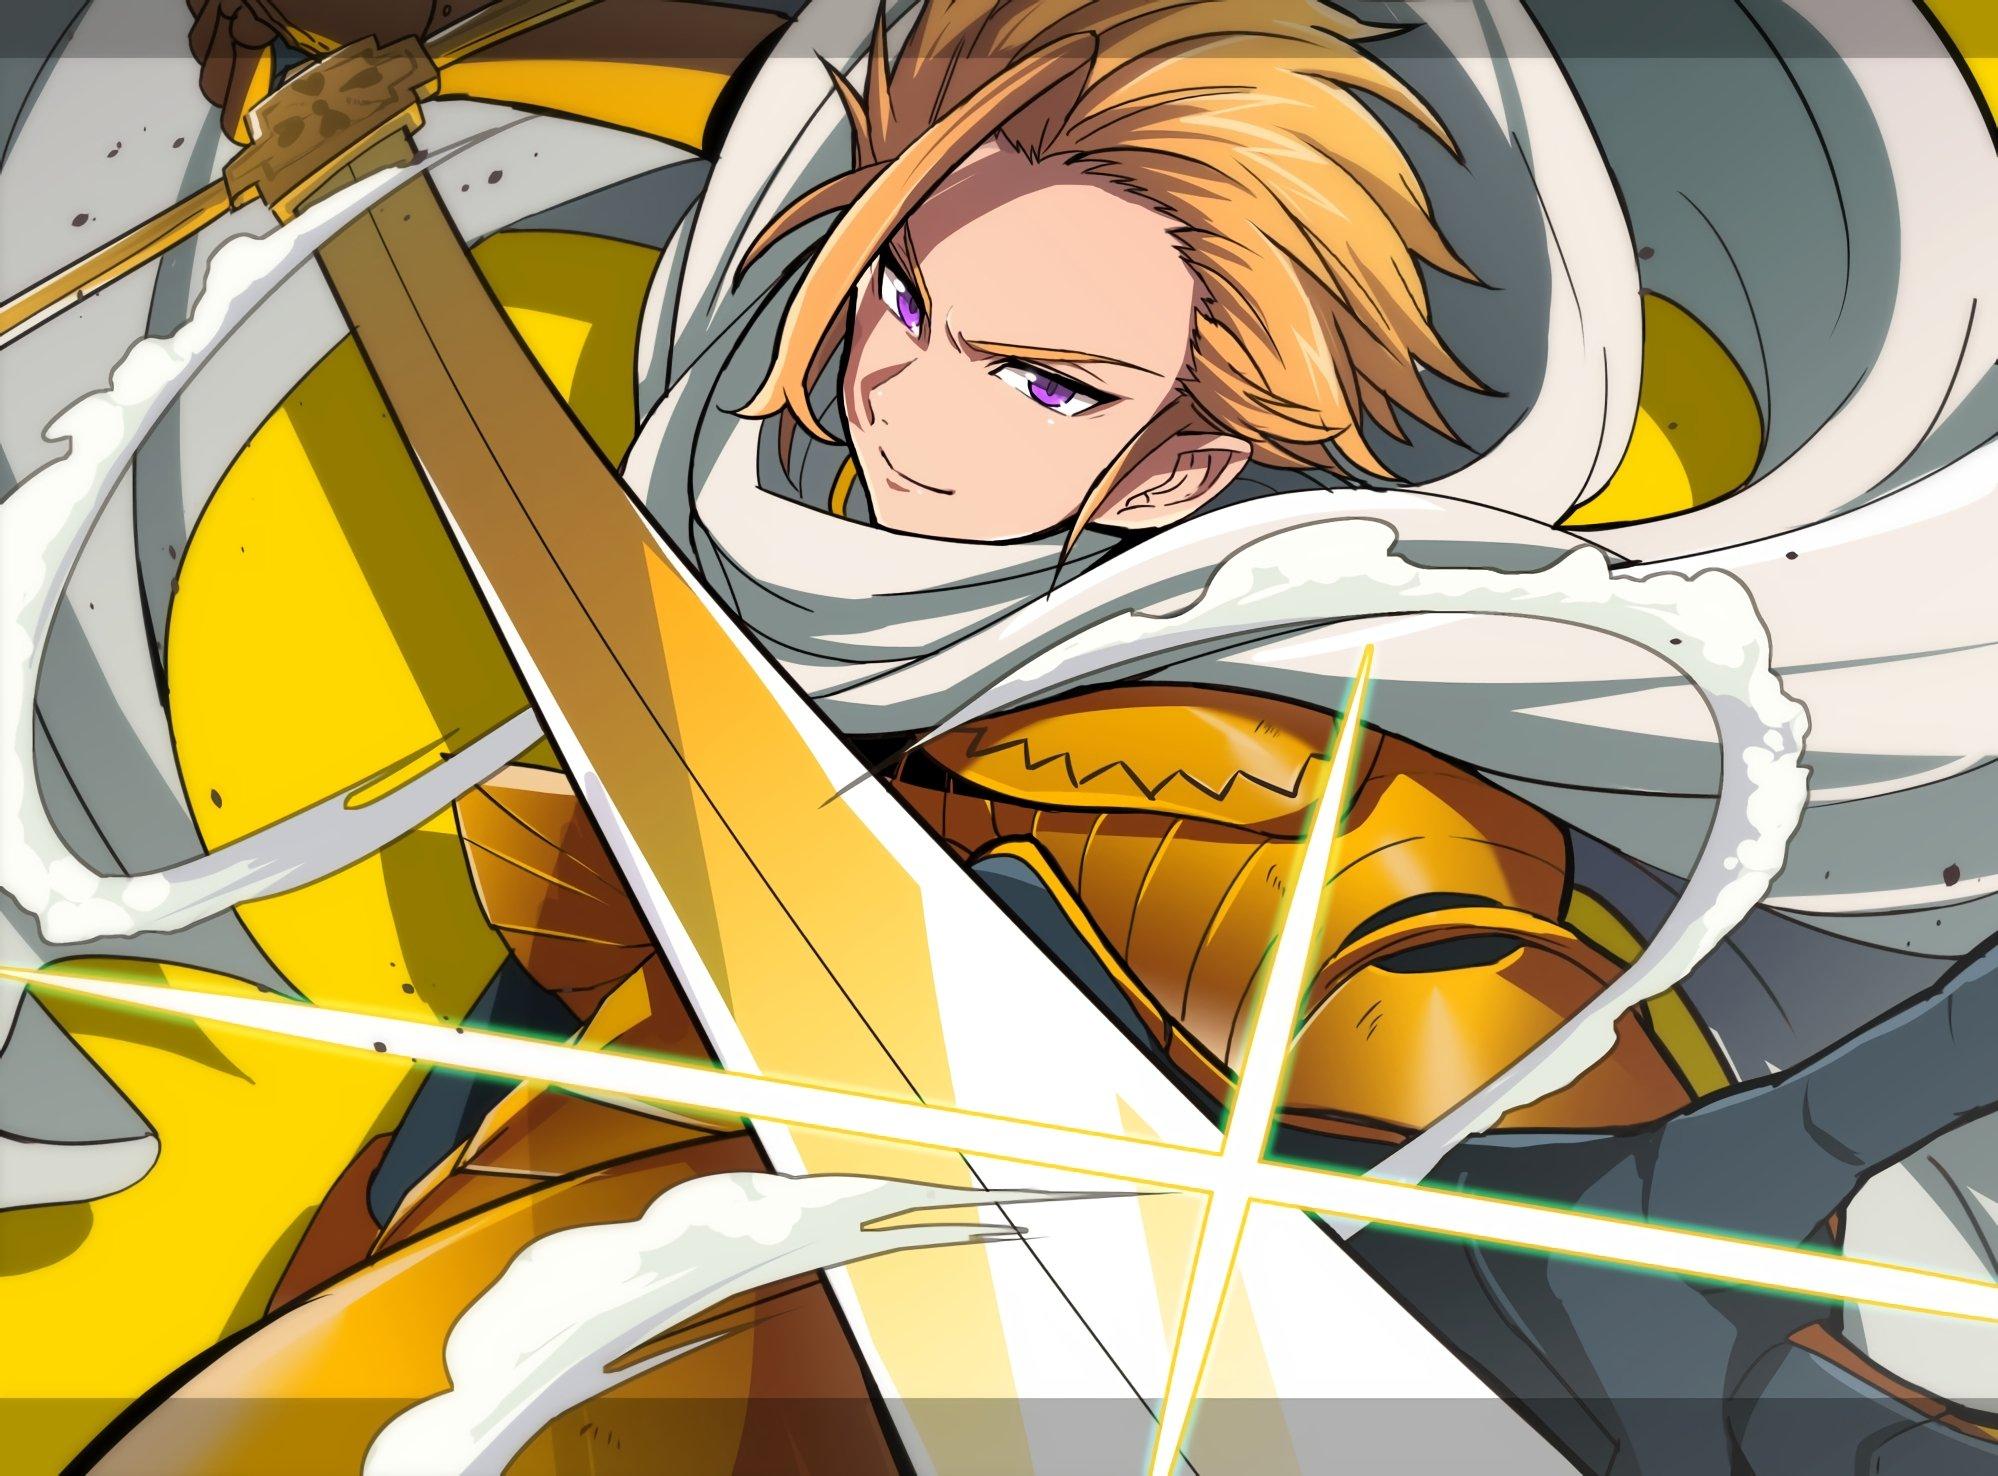 Anime Wallpaper Meriodasu with sword from The Seven Deadly Sins